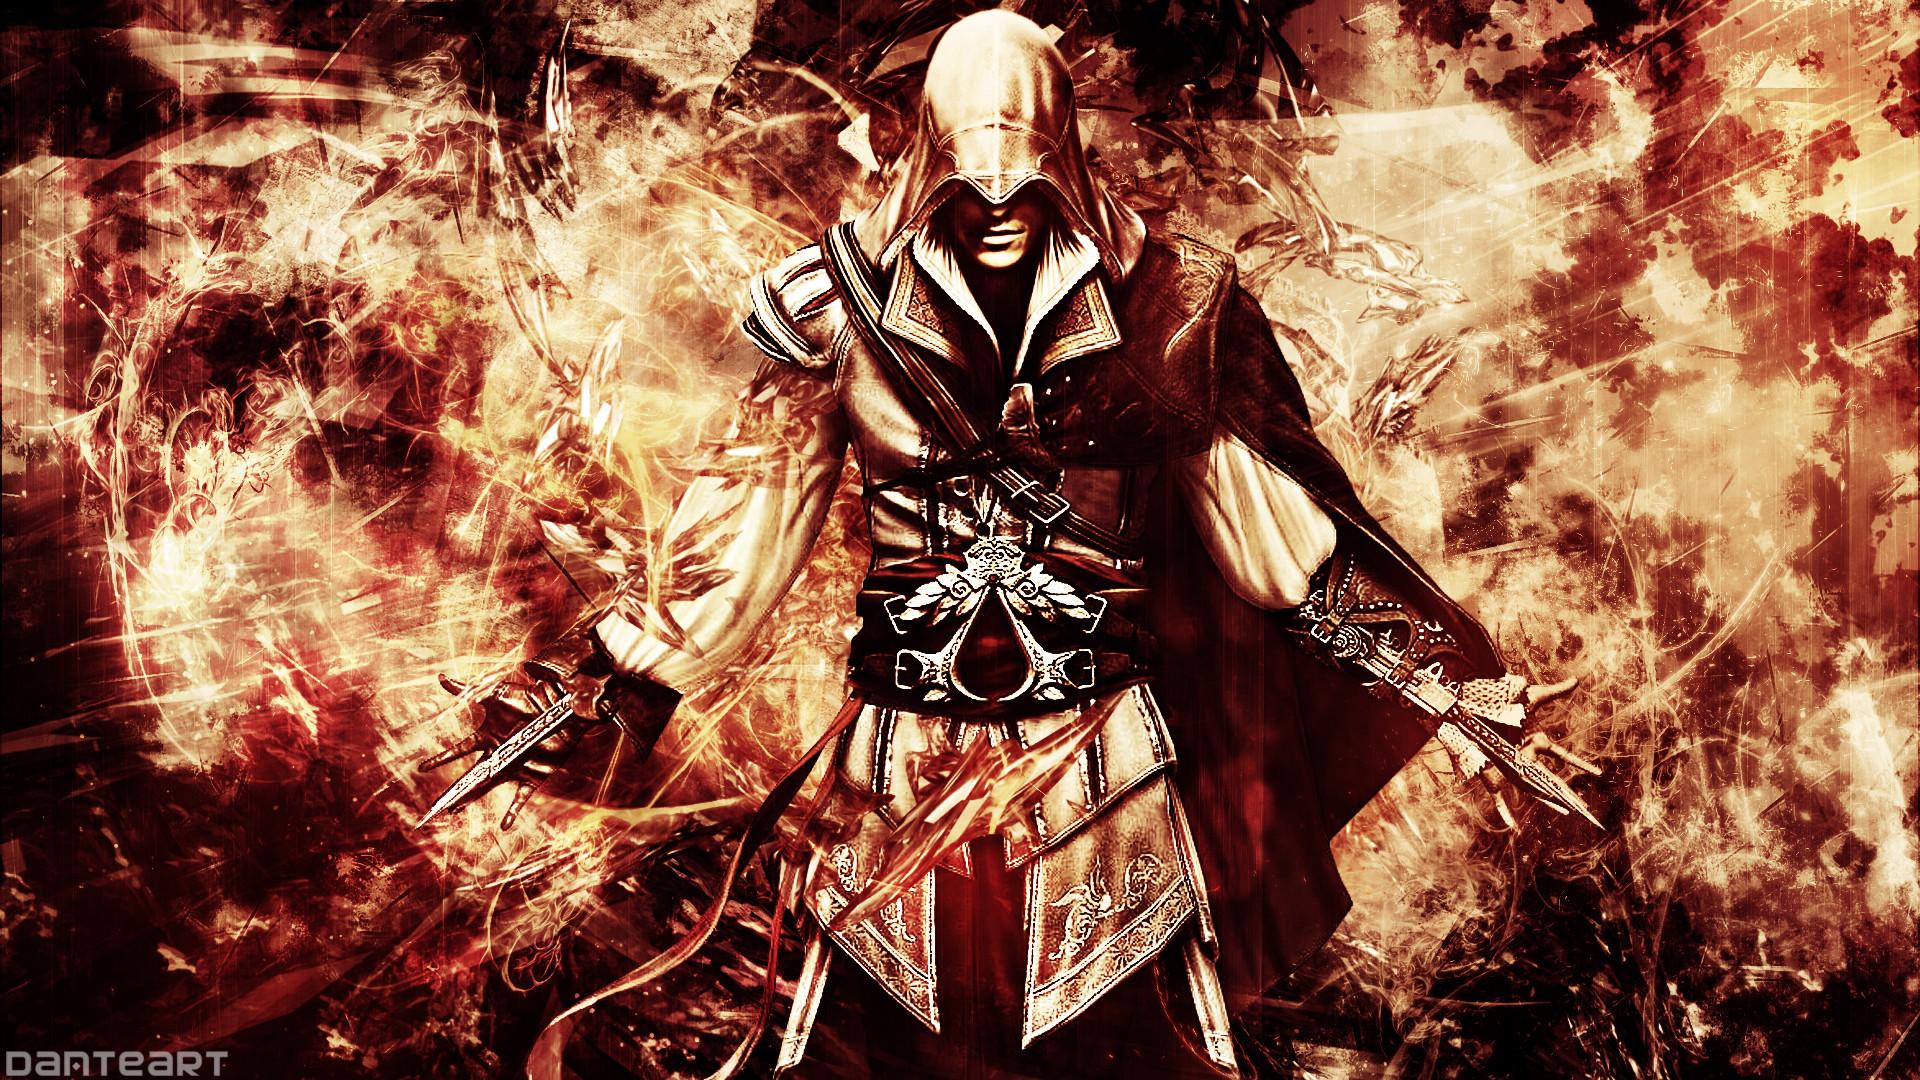 Assassins Creed 2 Wallpaper (82+ images)Assassins Creed Brotherhood Wallpaper 1920x1080